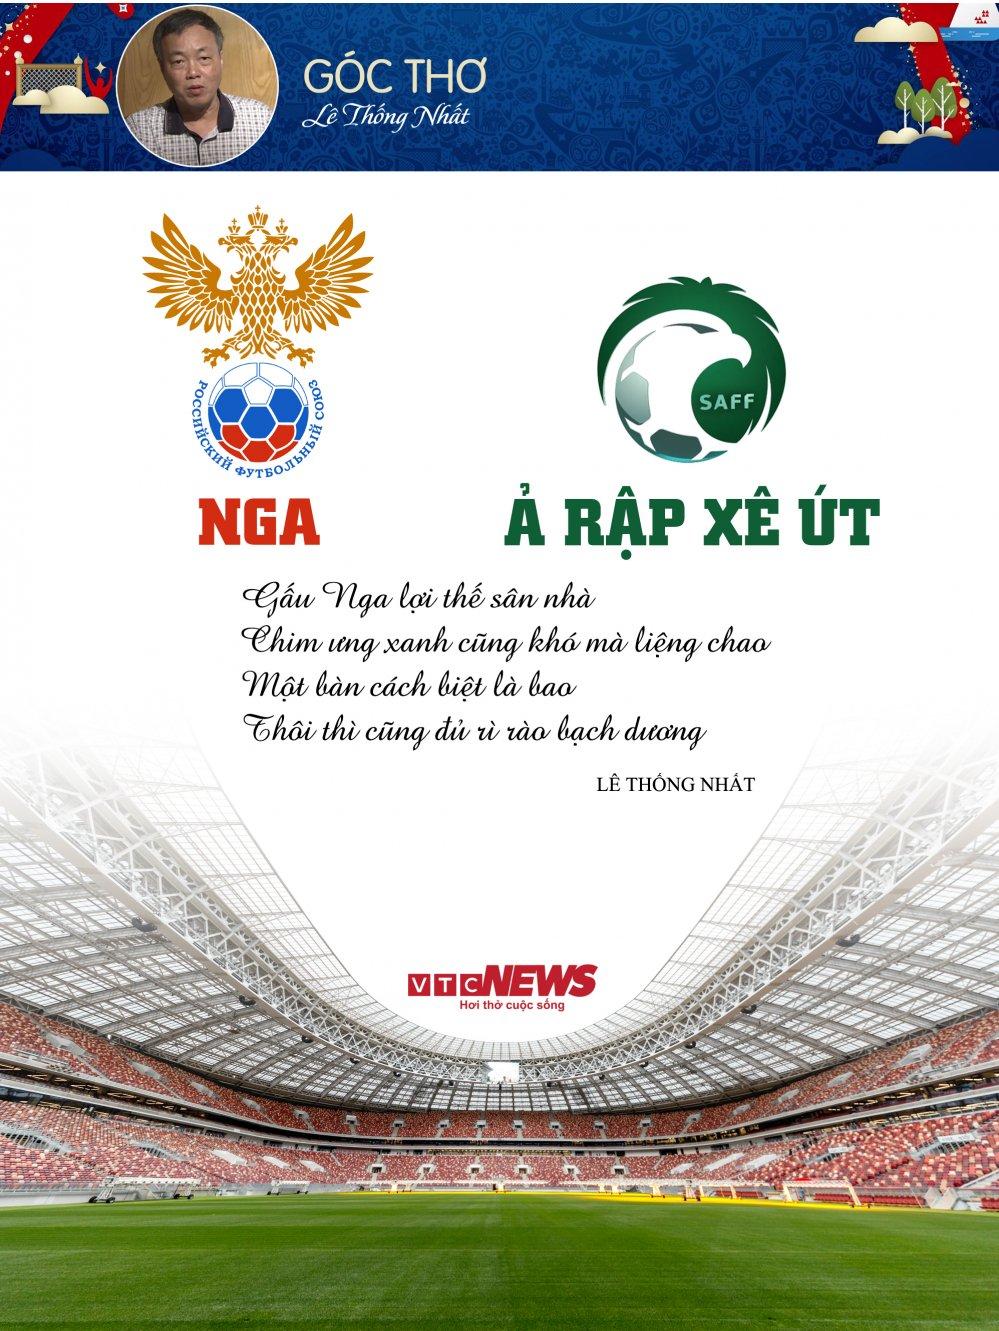 Tien si Le Thong Nhat lam tho du doan Nga thang sat nut A Rap Xe Ut hinh anh 1